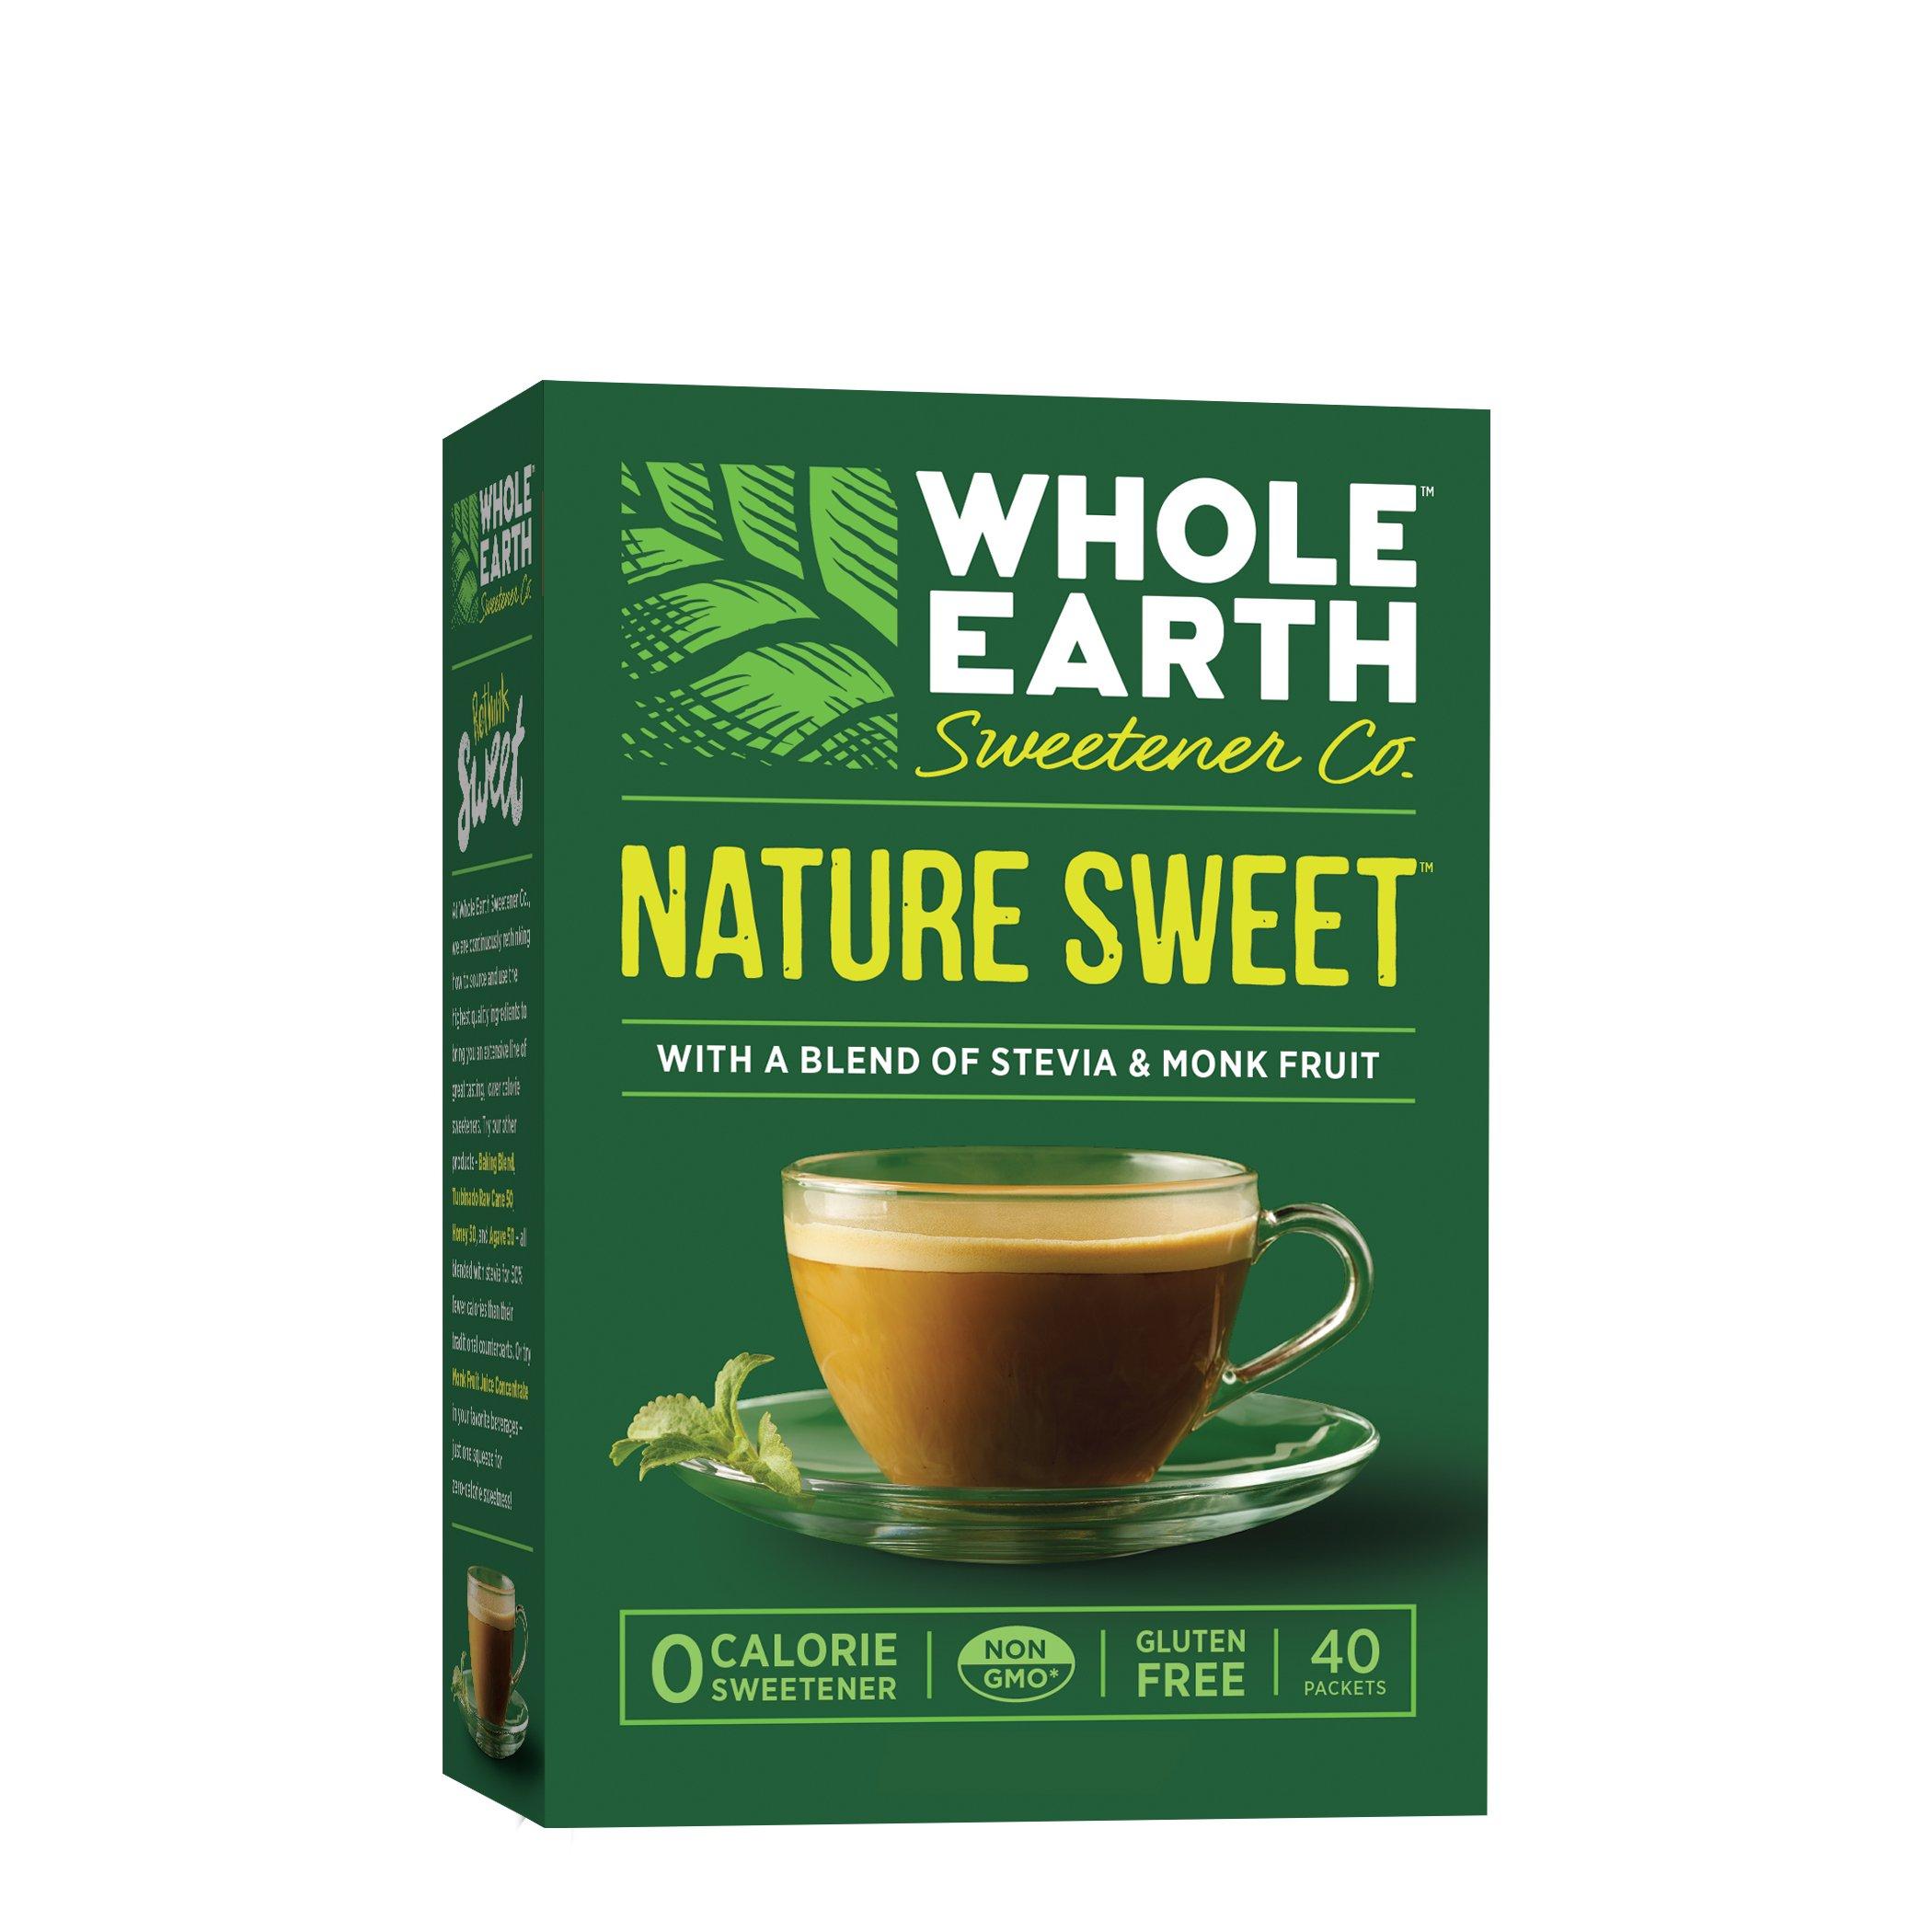 Whole Earth Sweetener Raw Sugar Amp Stevia Baking Blend